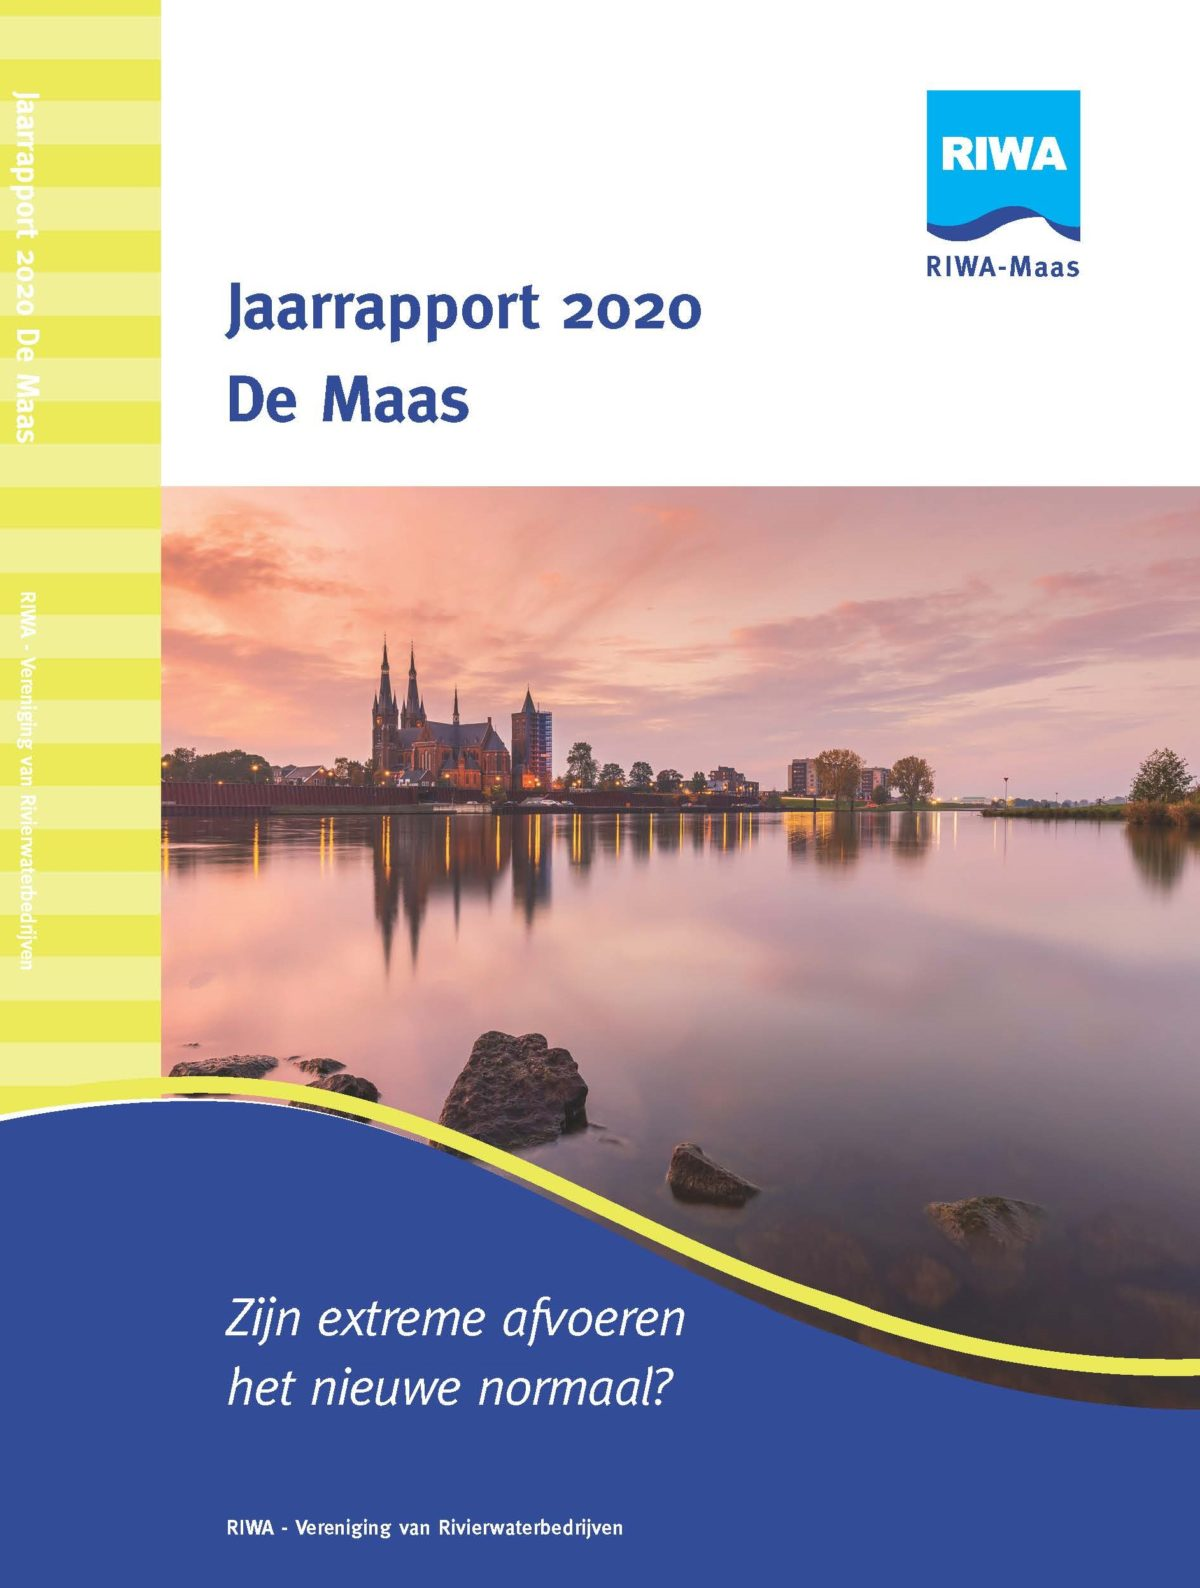 RIWA Jaarrapport 2020 De Maas